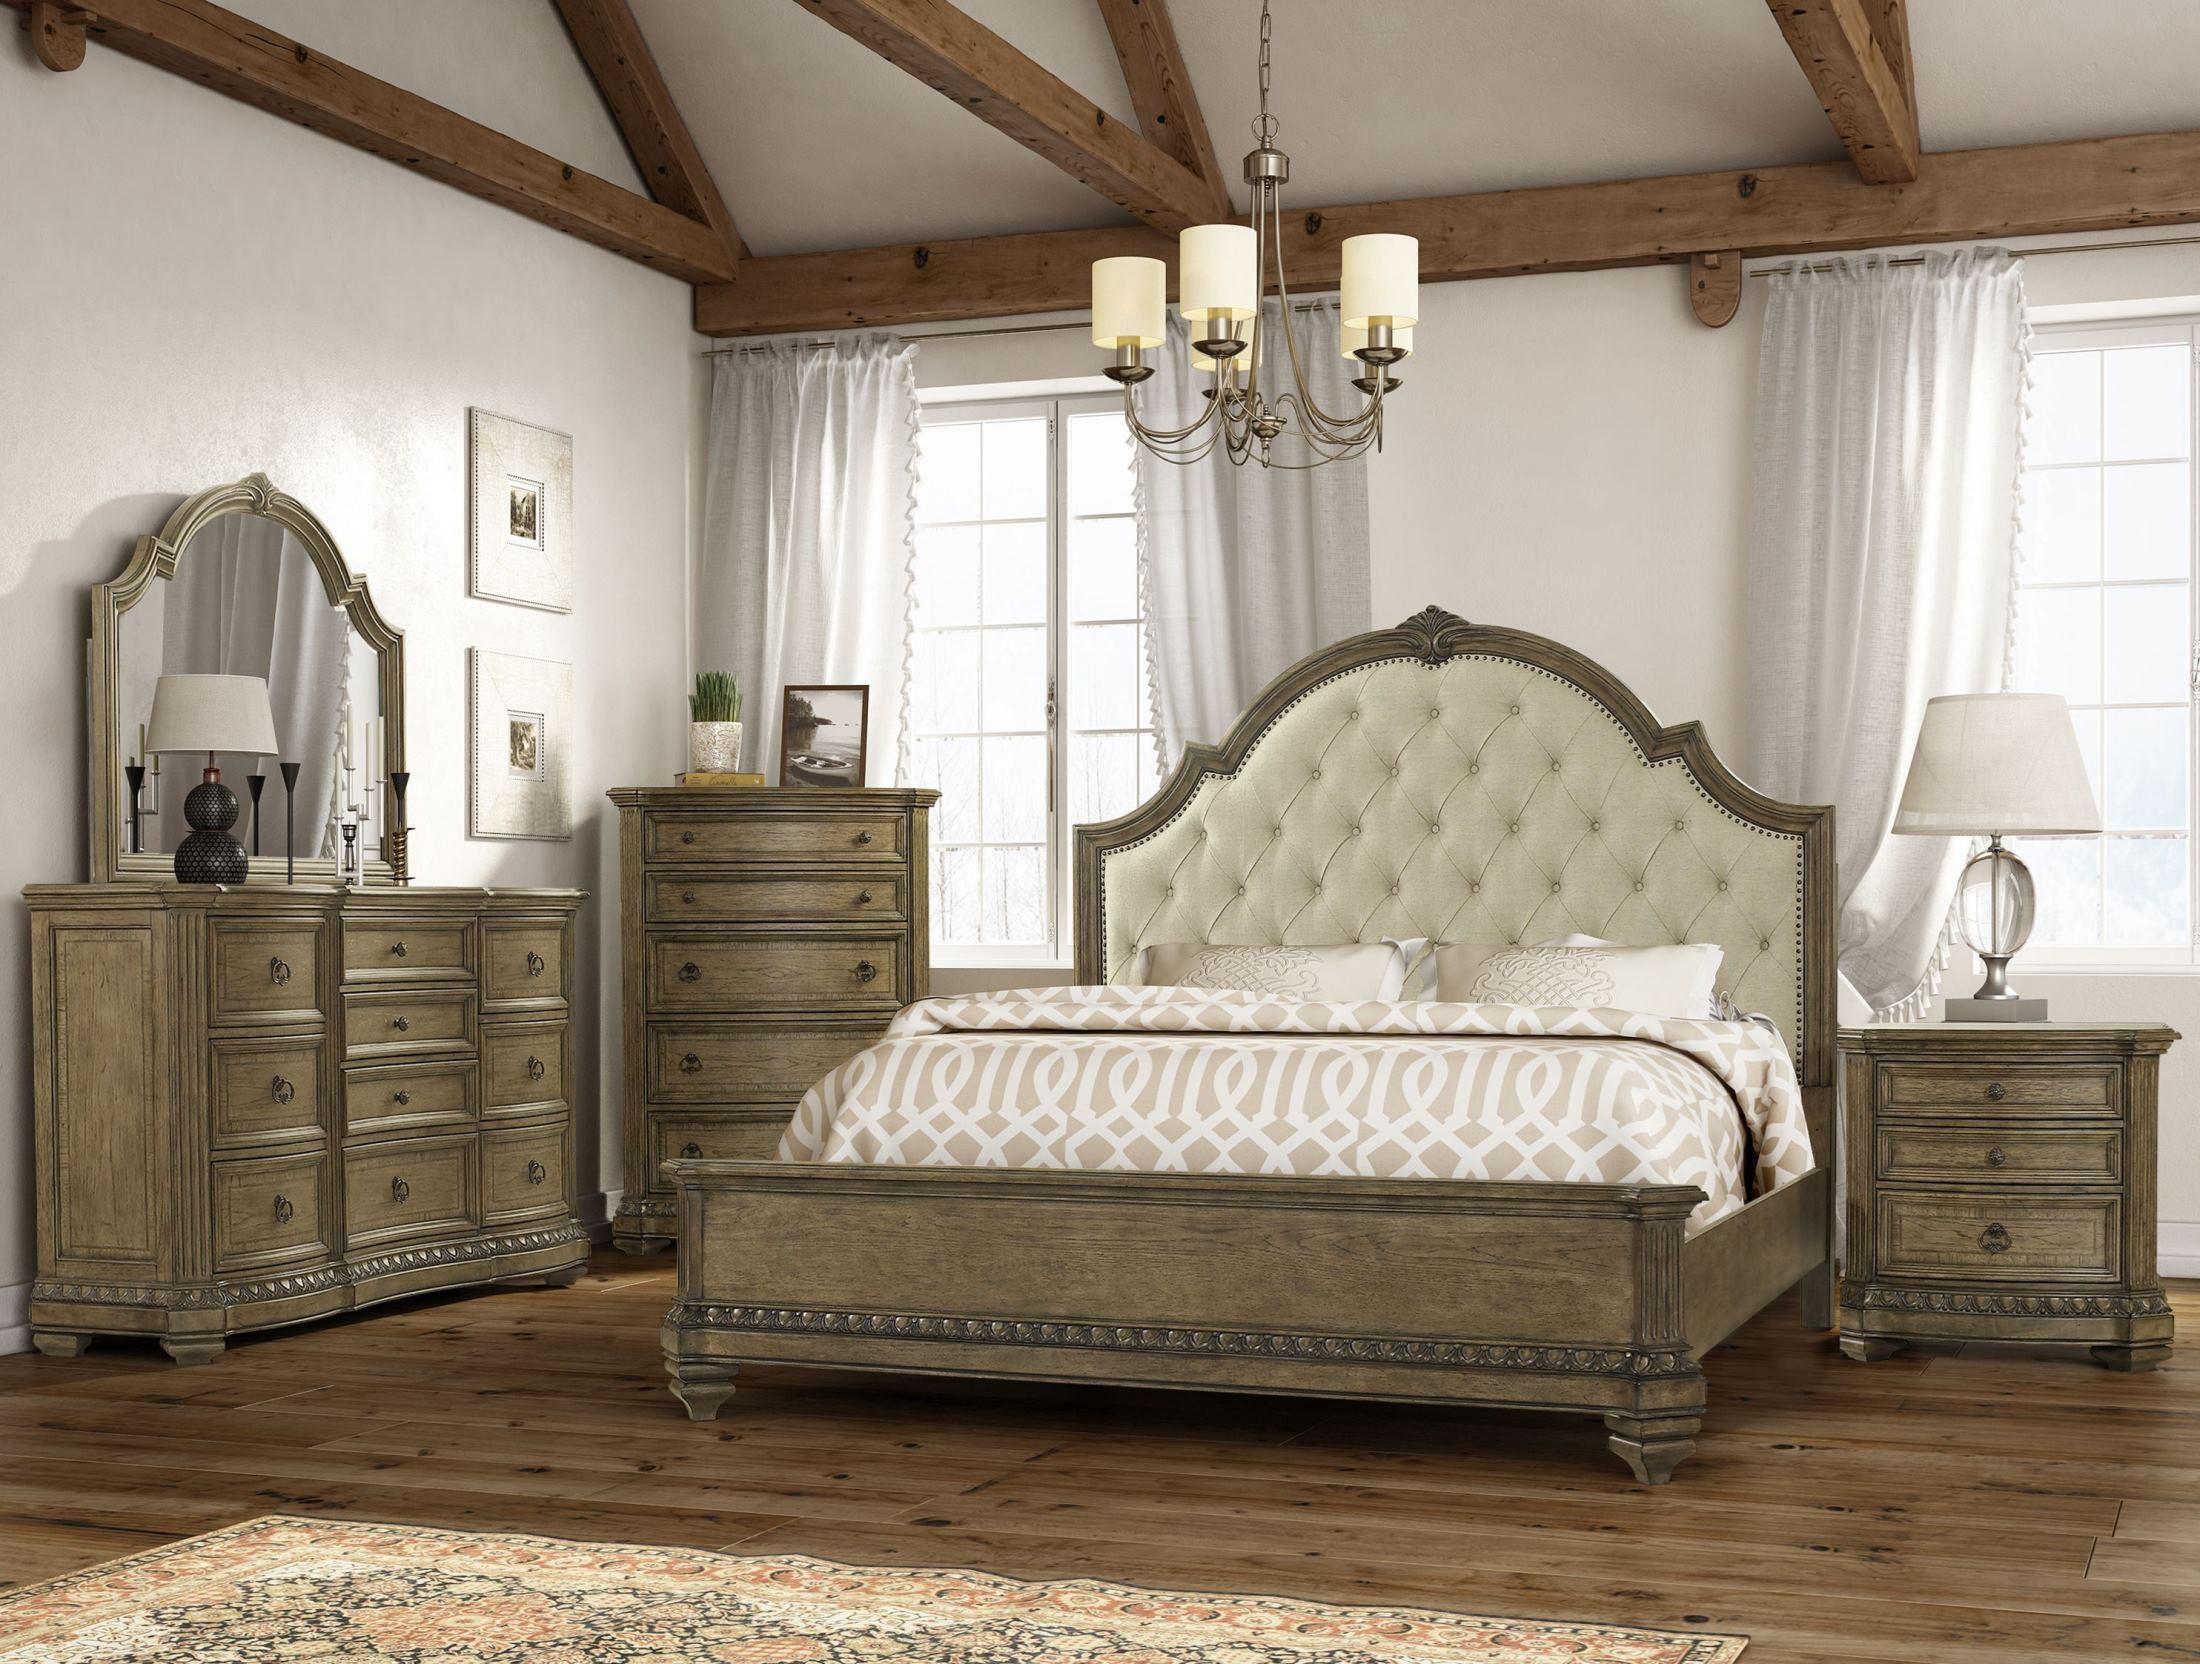 Touraine French Glazed Pecan Panel Bedroom Set from Fairmont ...